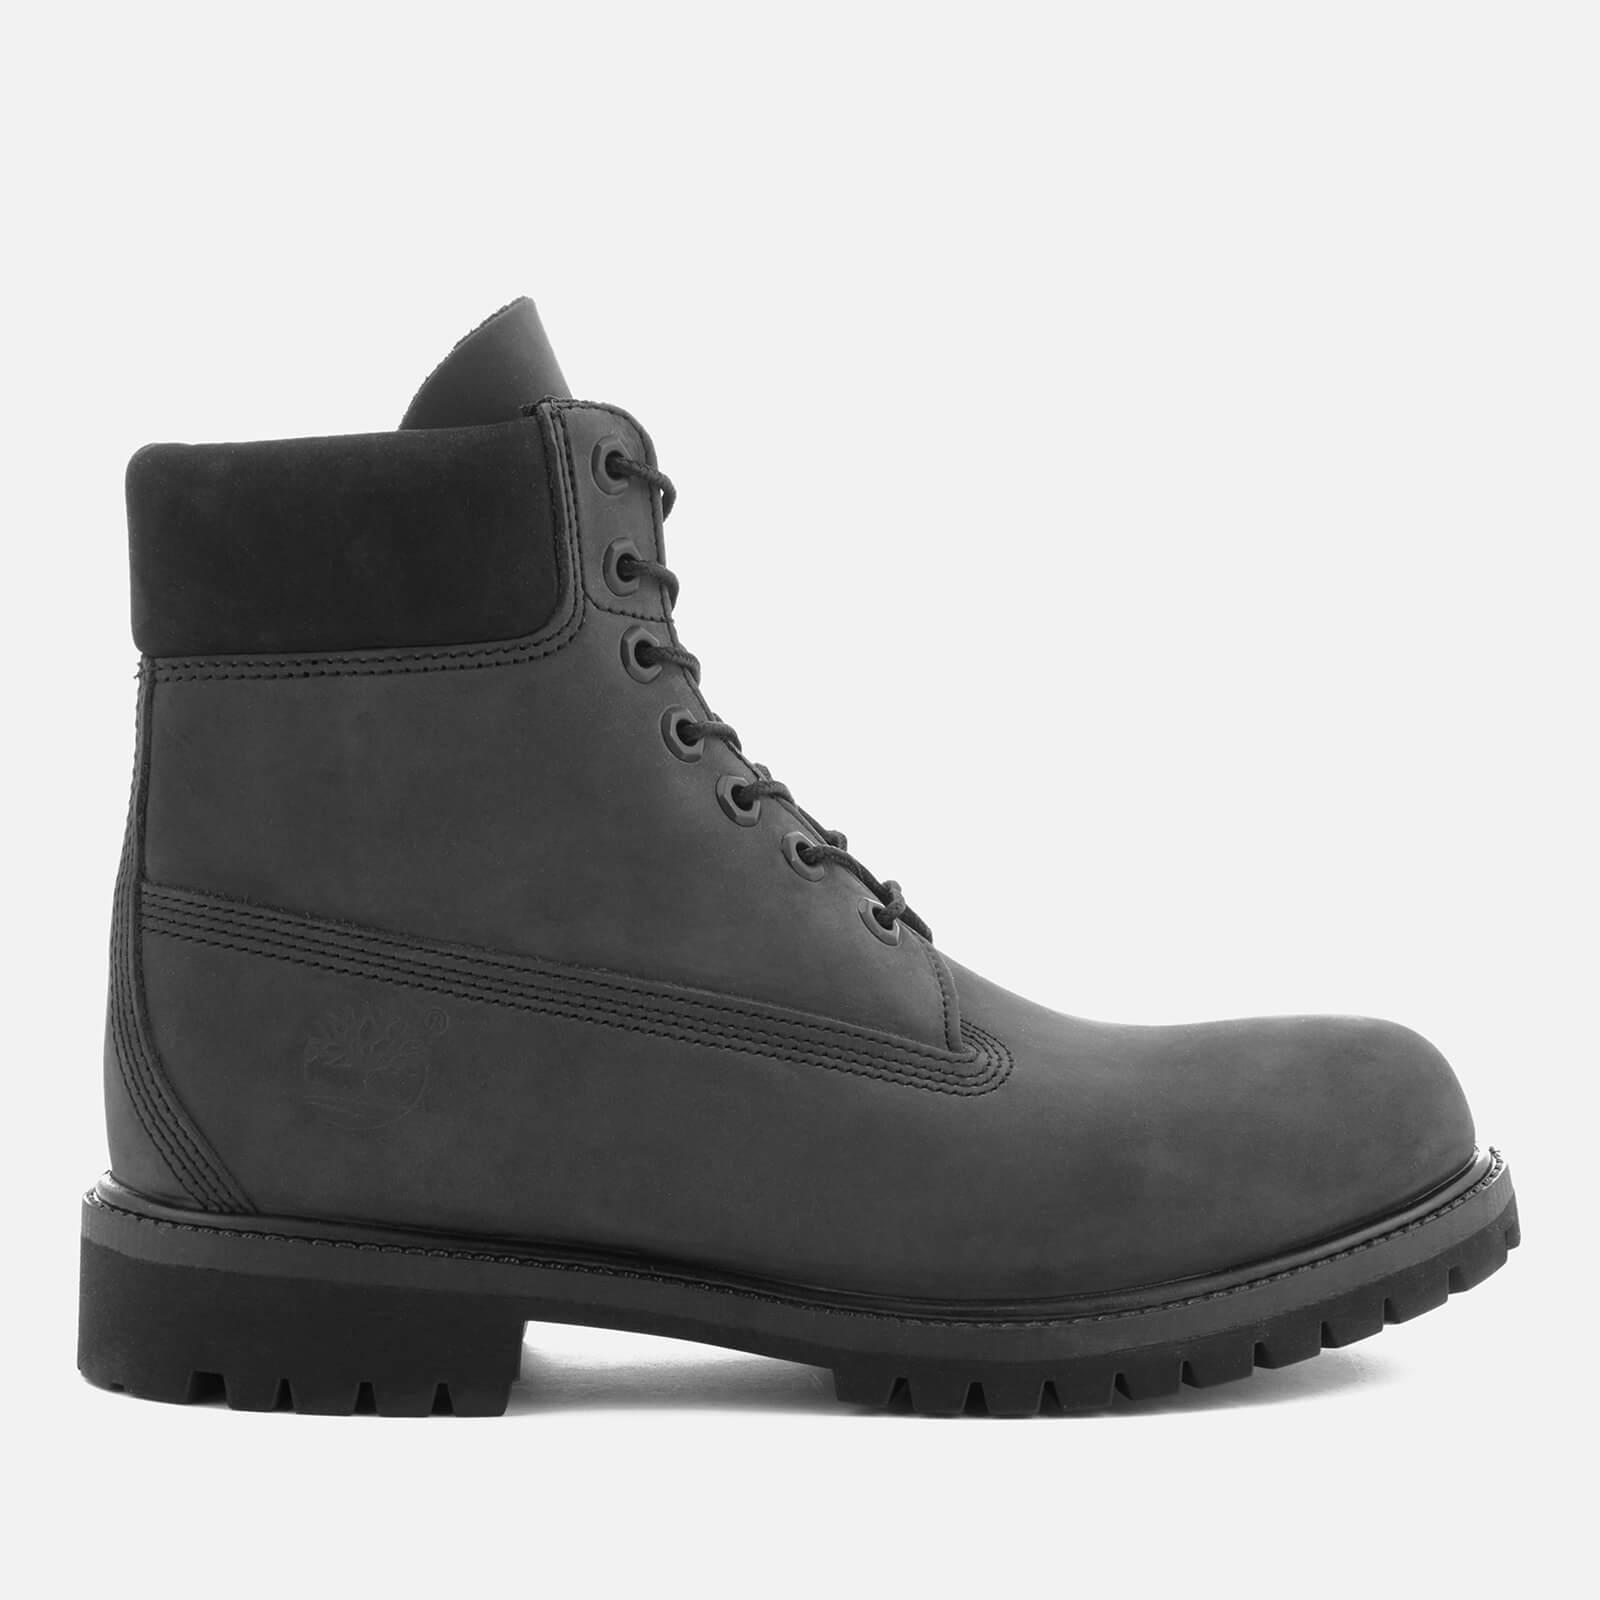 también Armario colina  Timberland Men's 6 Inch Premium Lace Up Boots - Forged Iron Waterbuck |  TheHut.com